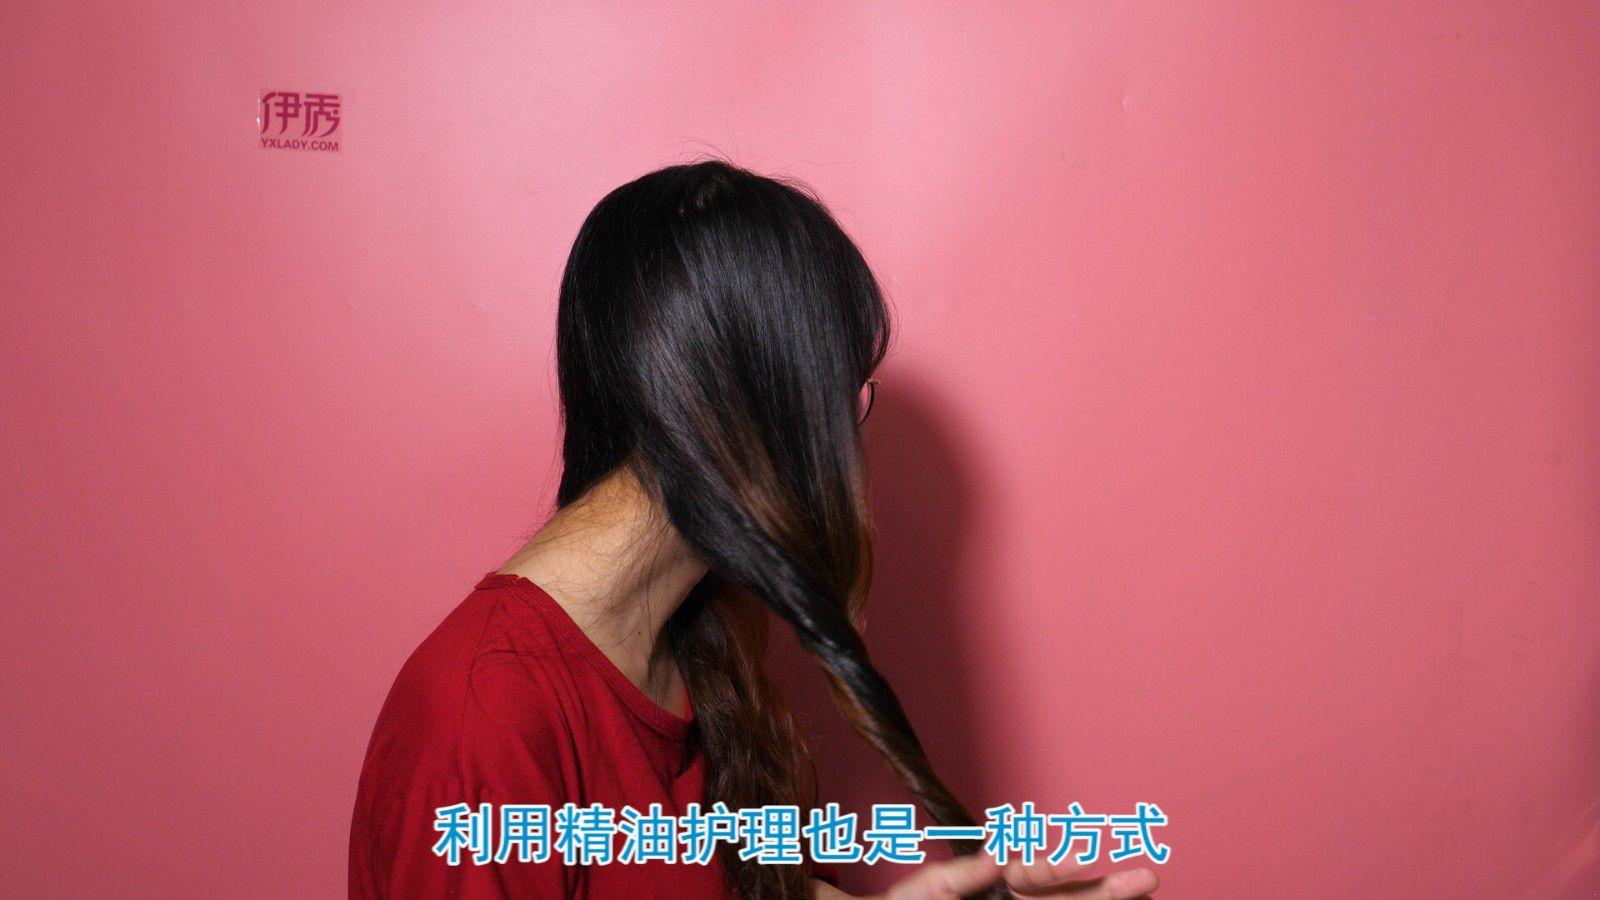 卷发怎么打理|卷发怎么打理|卷发|长发|